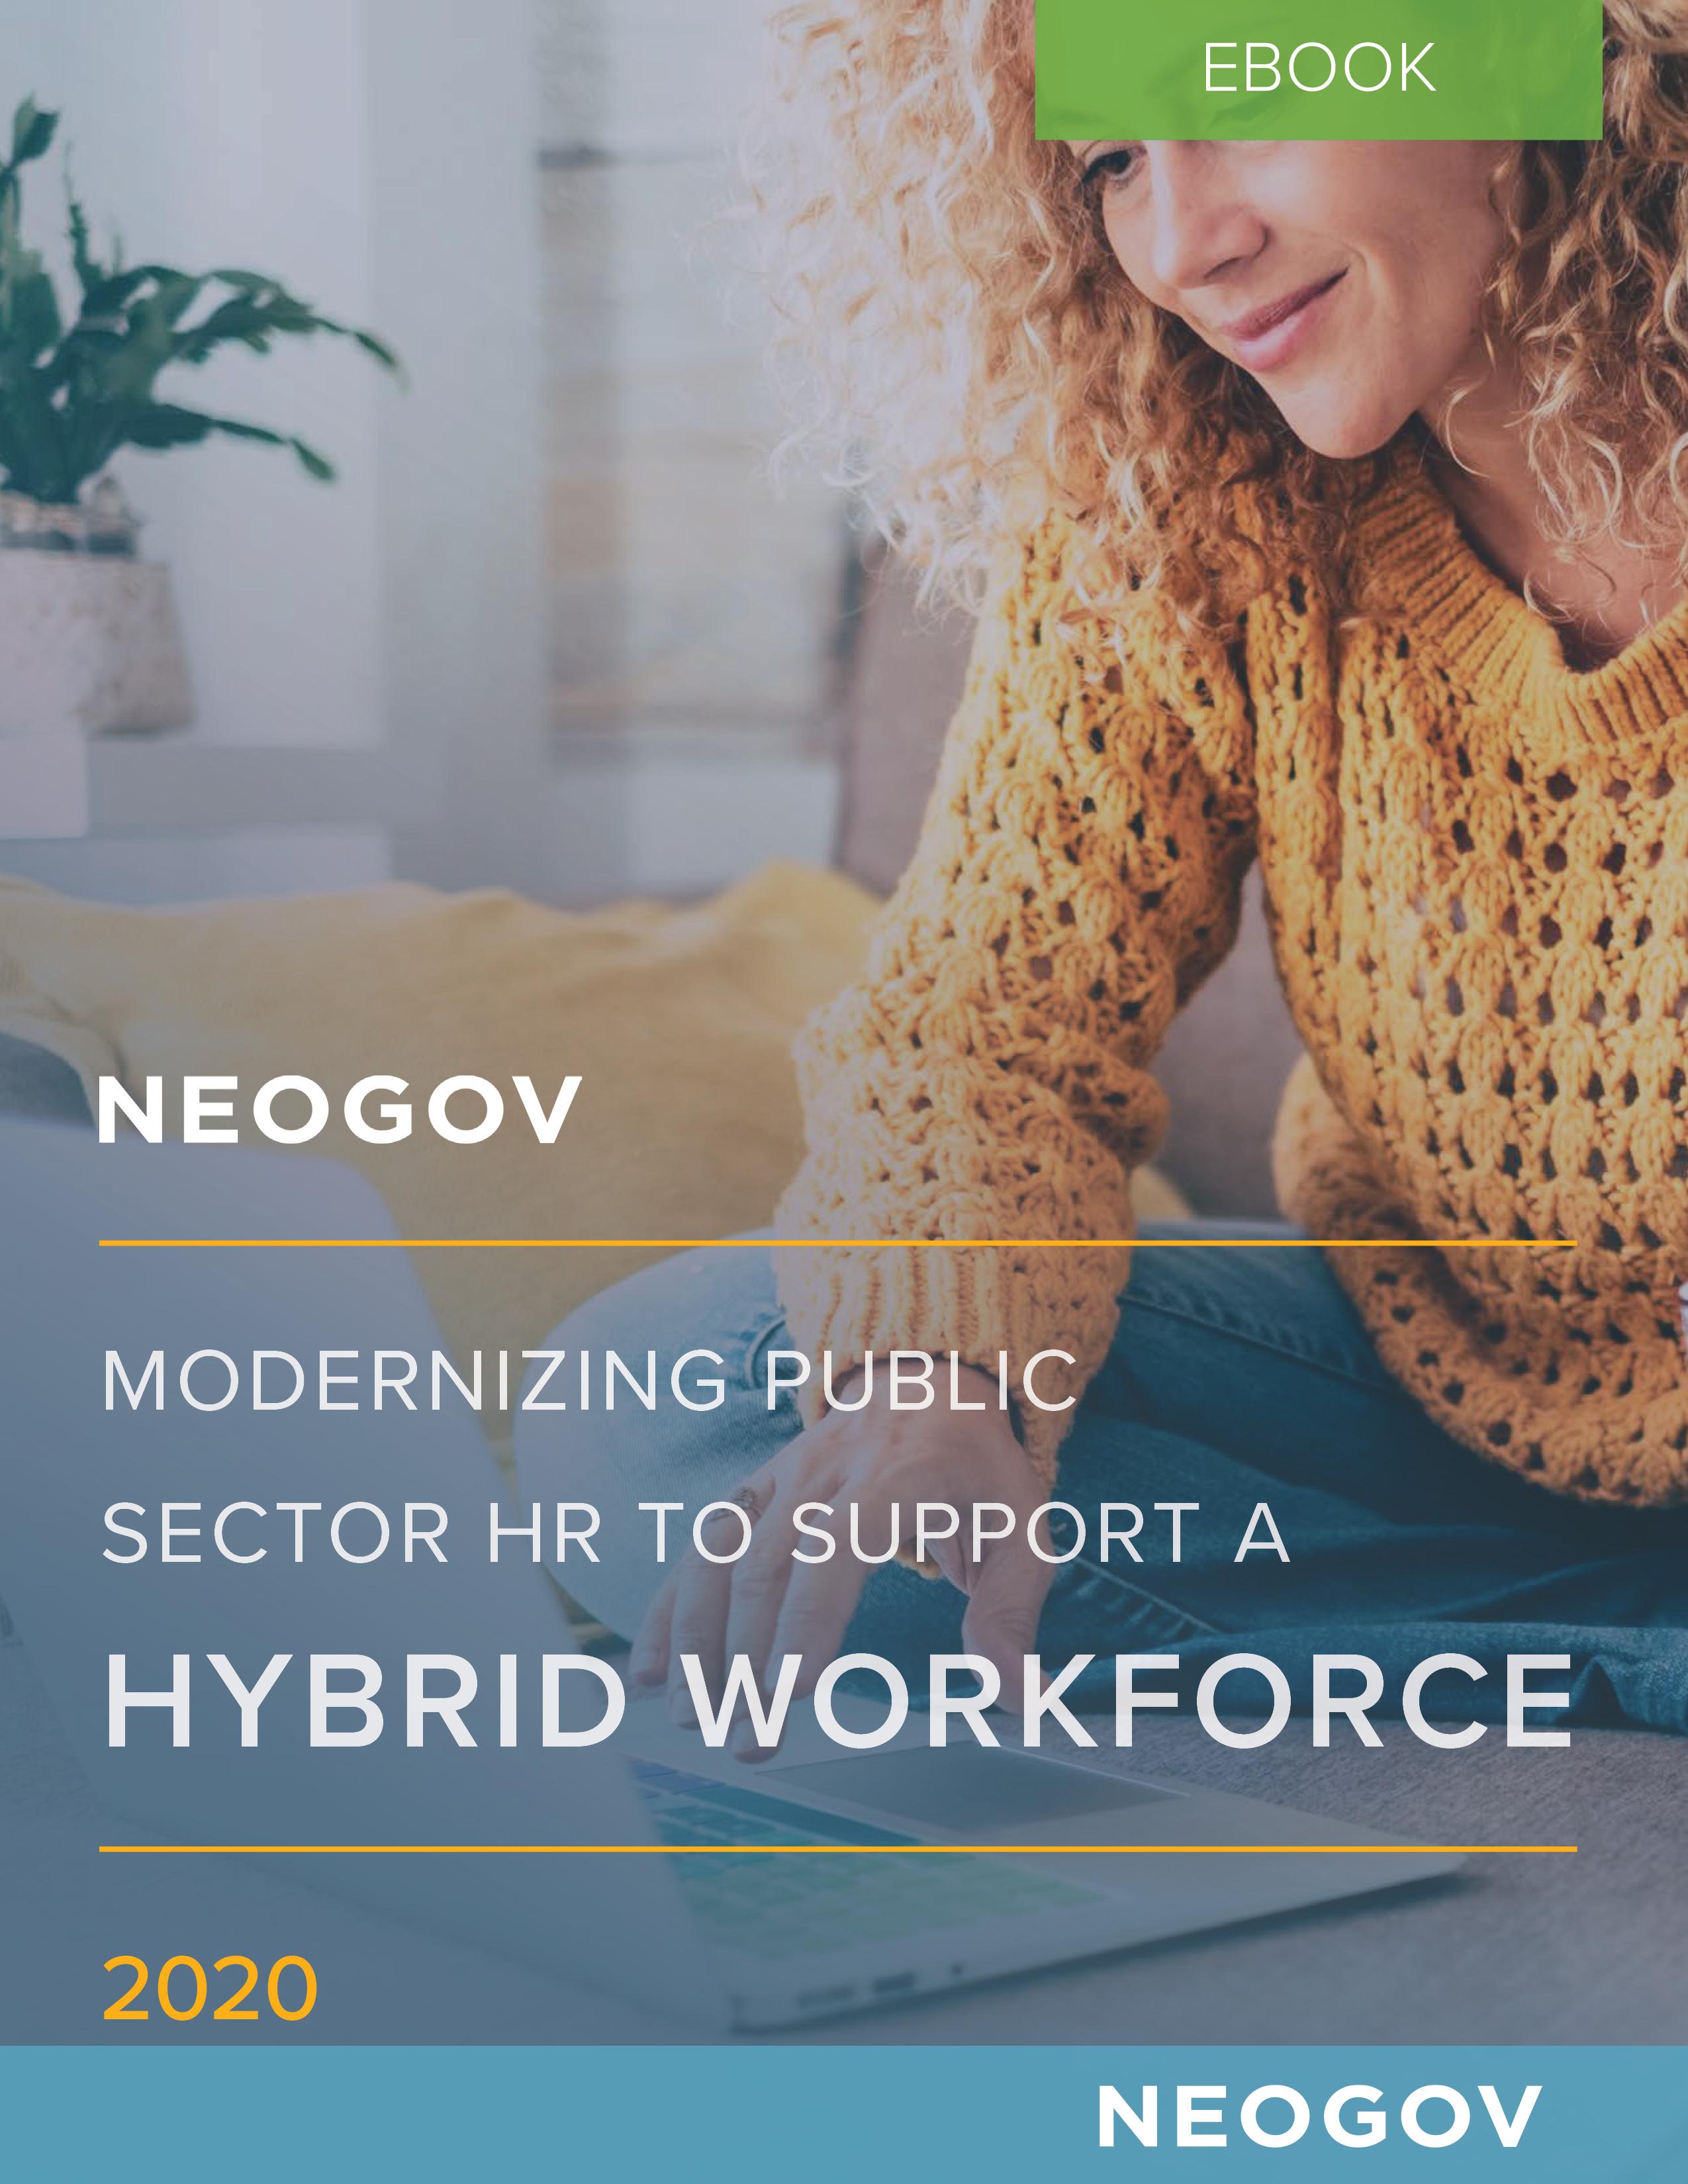 Modernizing Public Sector HR